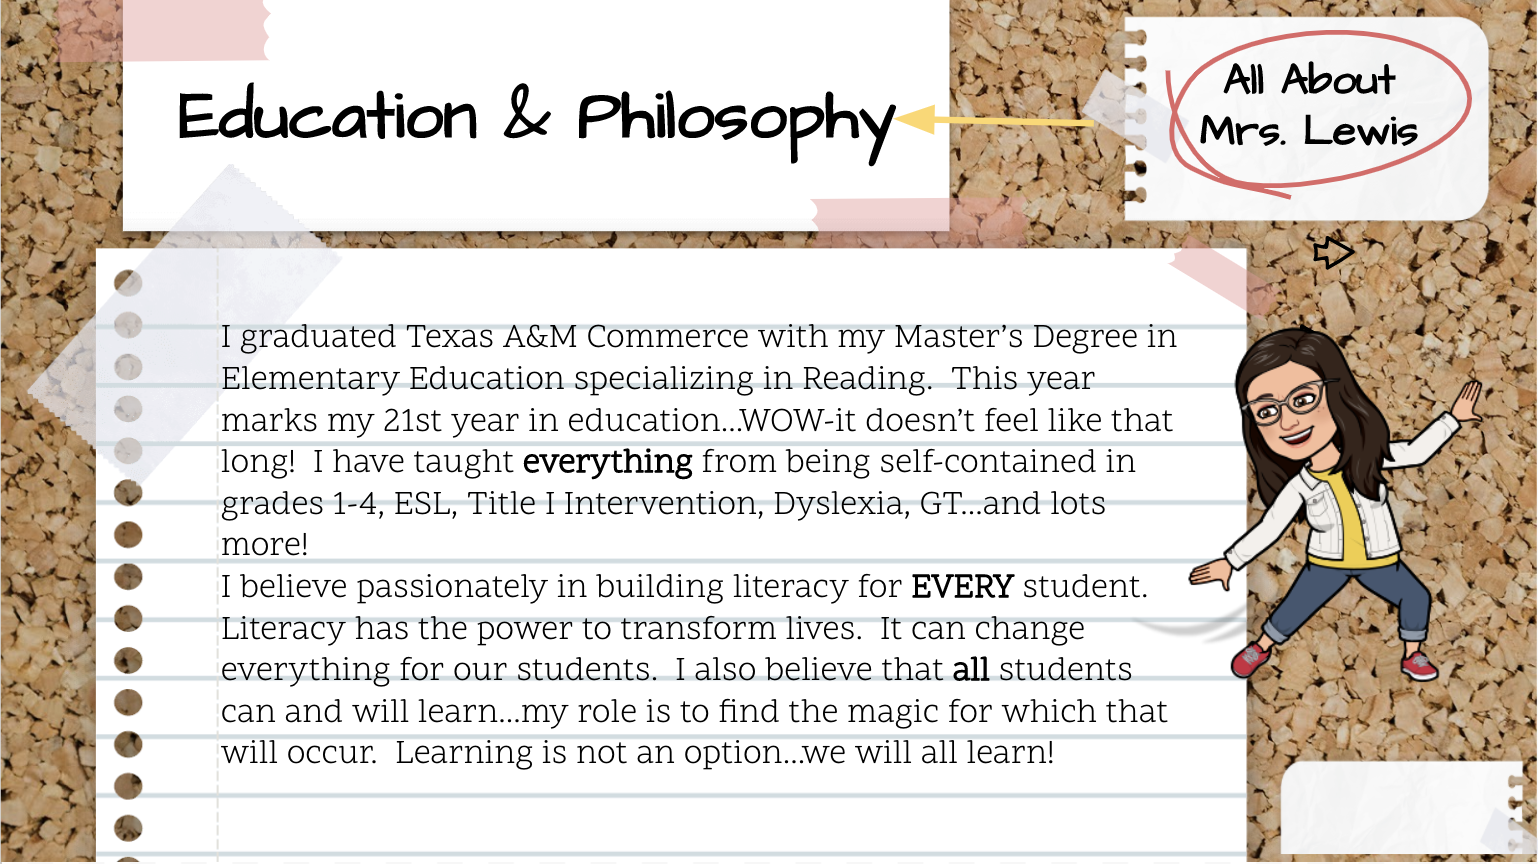 Education & Philosophy